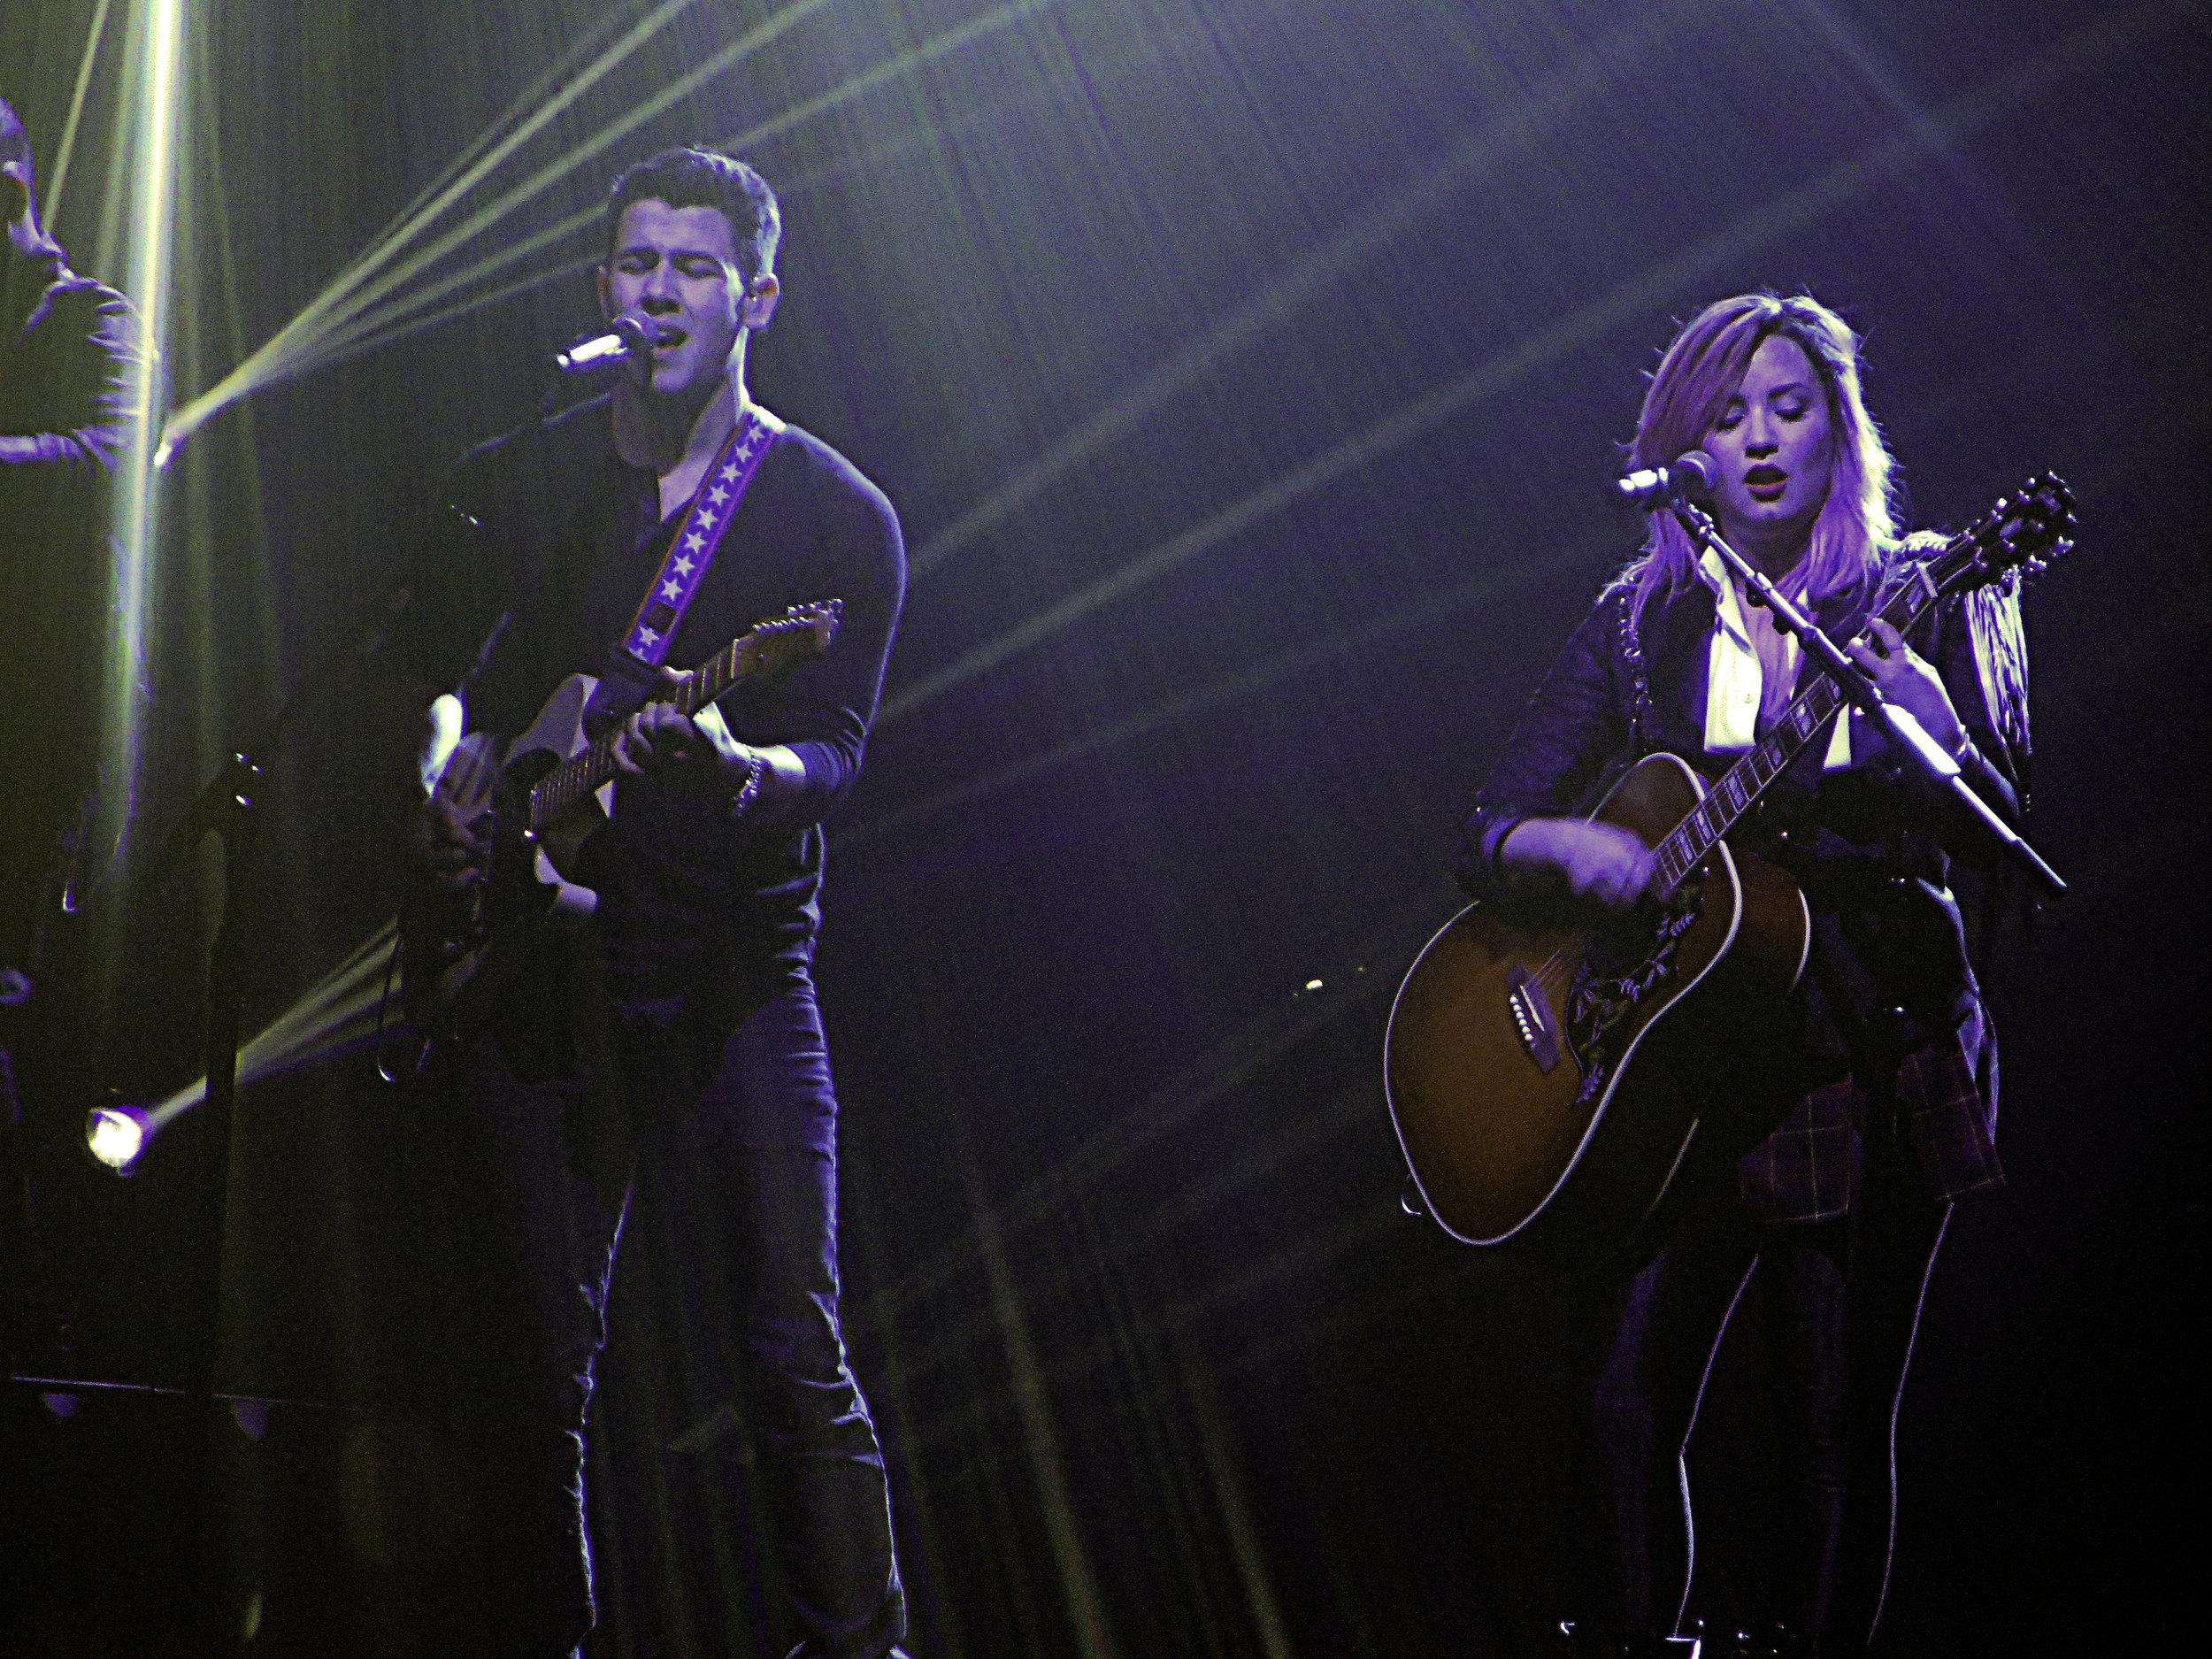 Nick Jonas & Demi Lovato